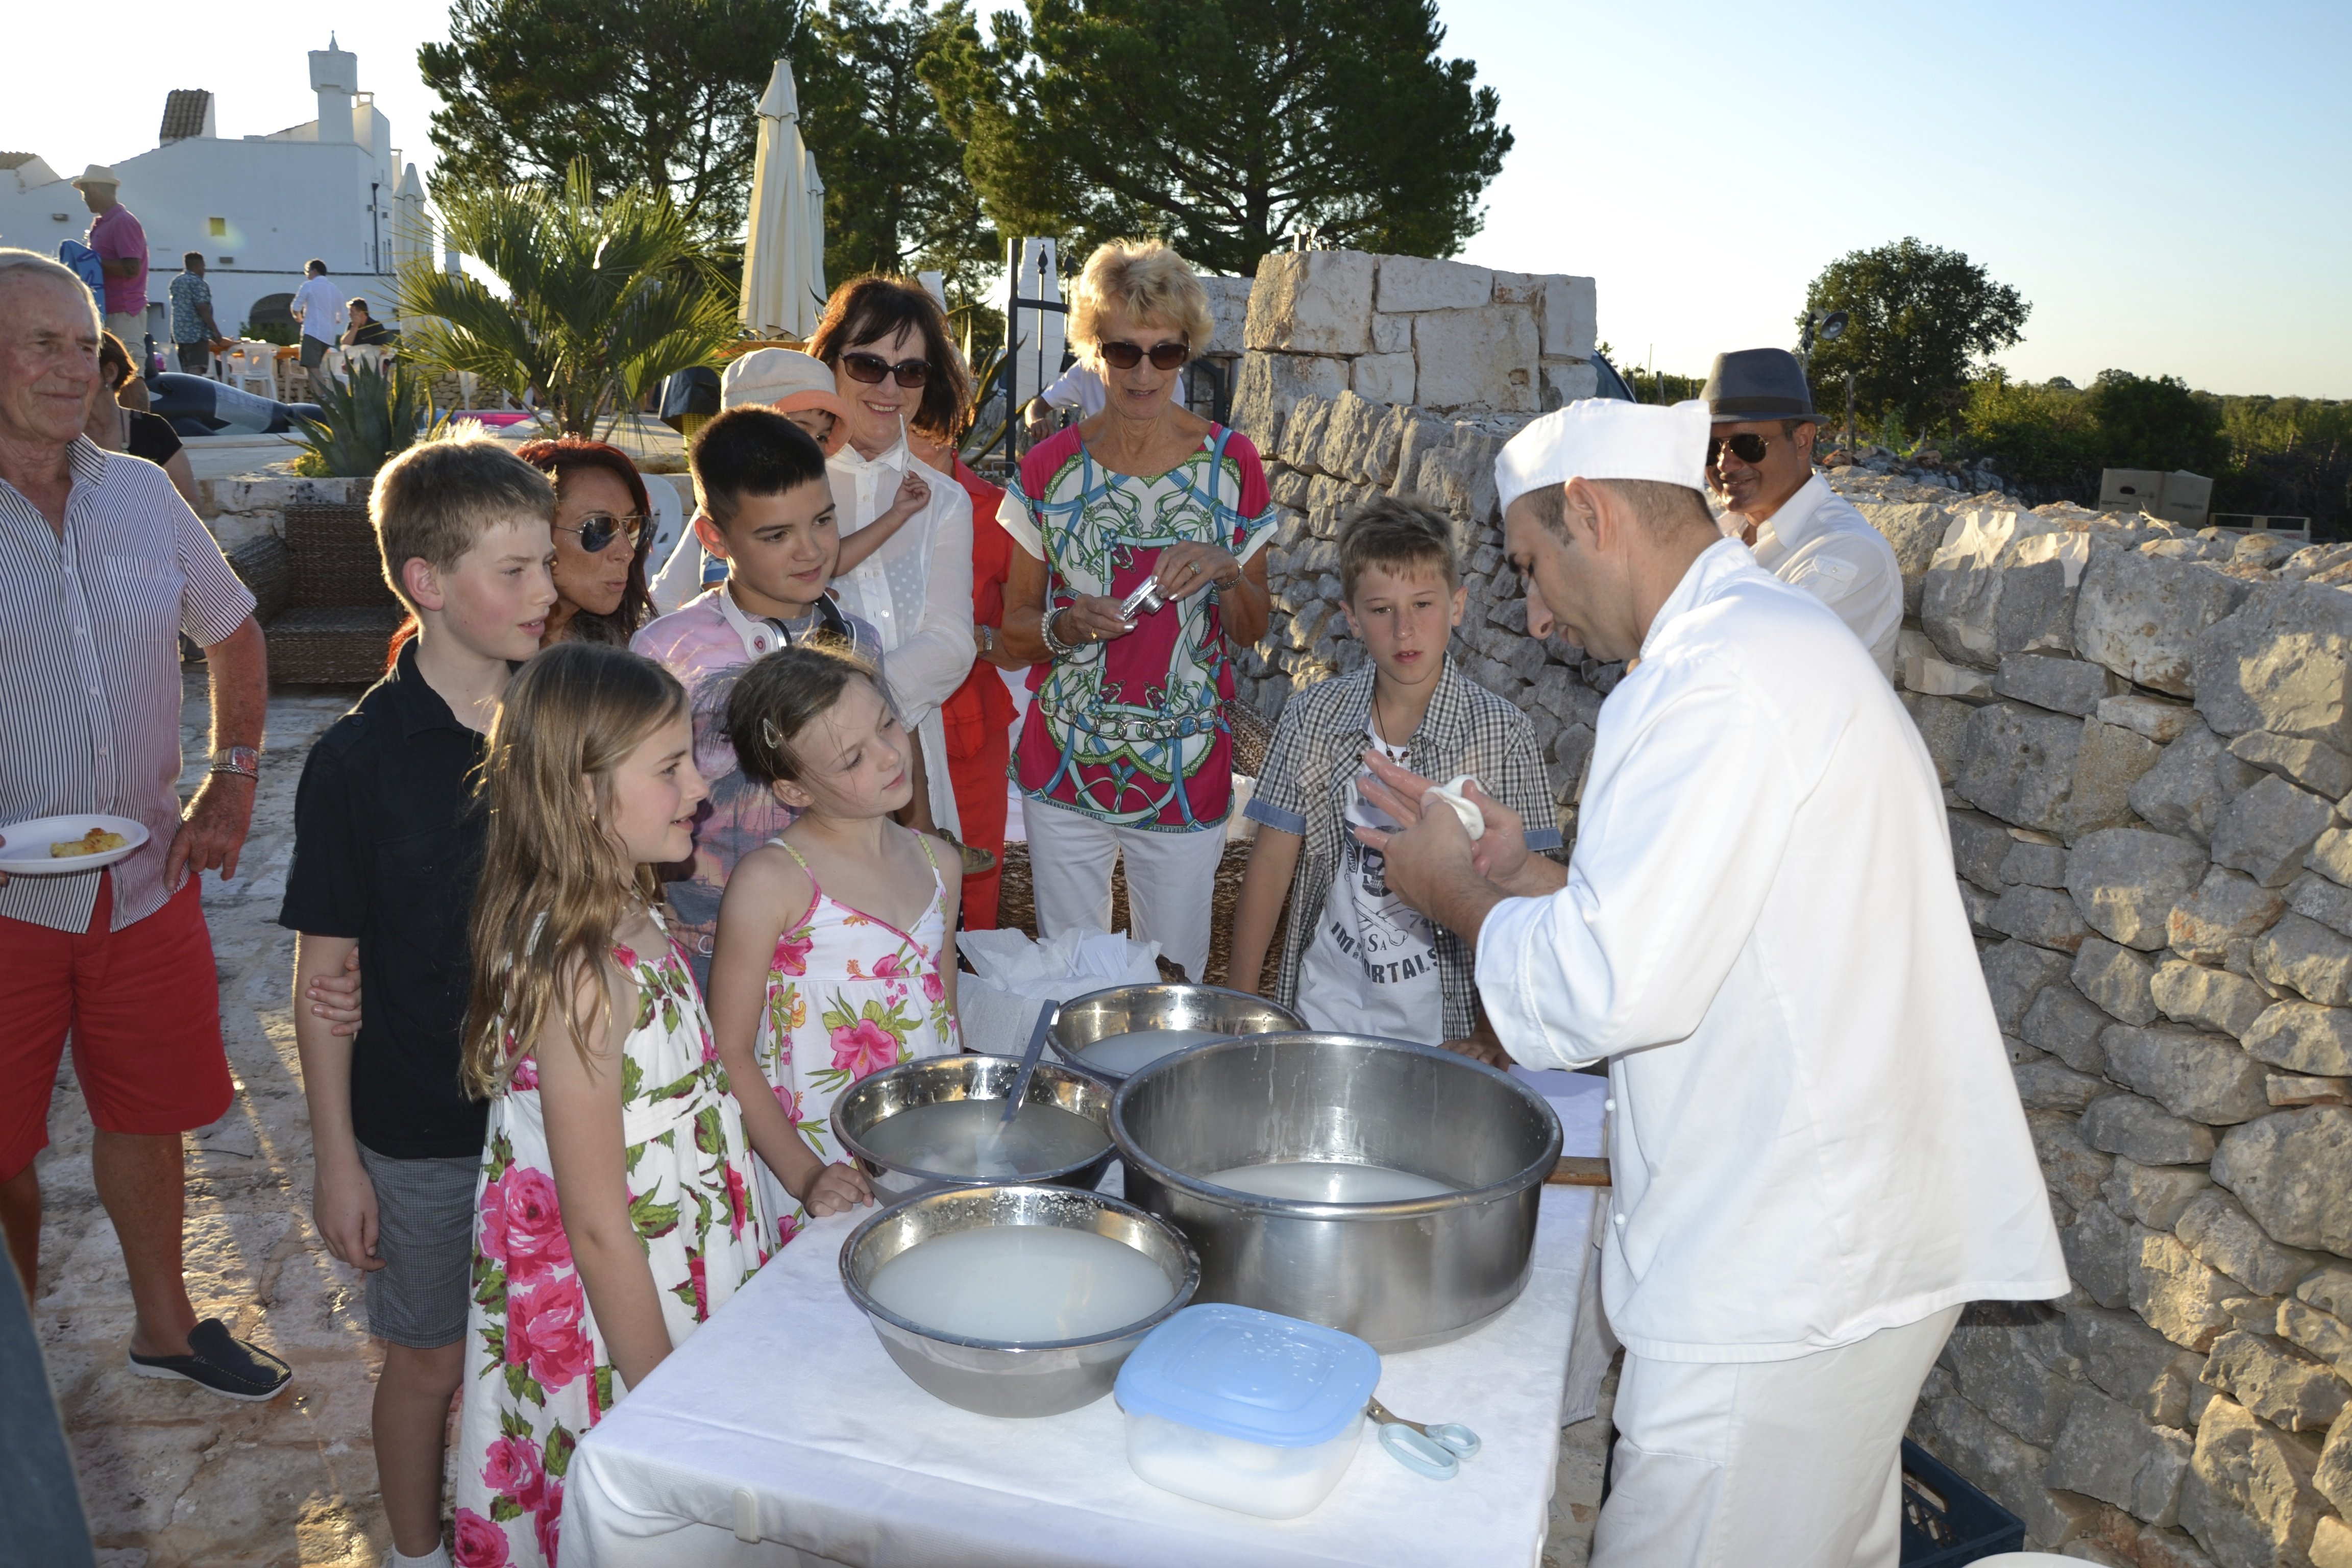 The Cheese man makes fresh mozzarella at our pre wedding dinner held at the Masseria Della Zingara